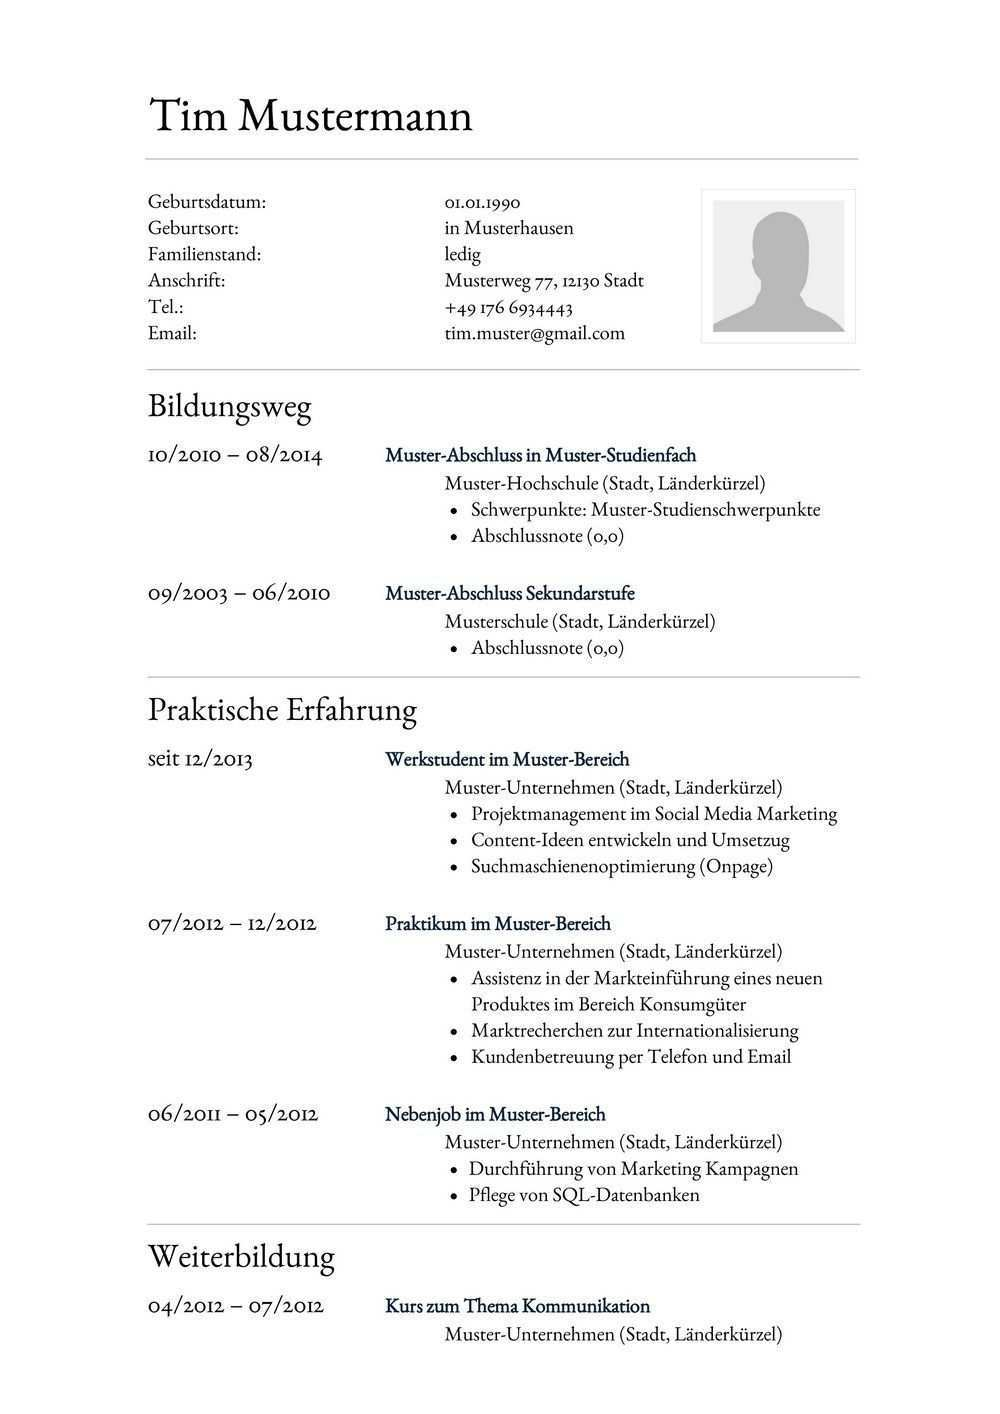 Lebenslauf Aufbau Muster Lebenslauf Beispiel Lebenslauf Muster Vorlage Beispiel Fuer Assistent Au In 2020 Resume Template Resume Template Word Document Templates